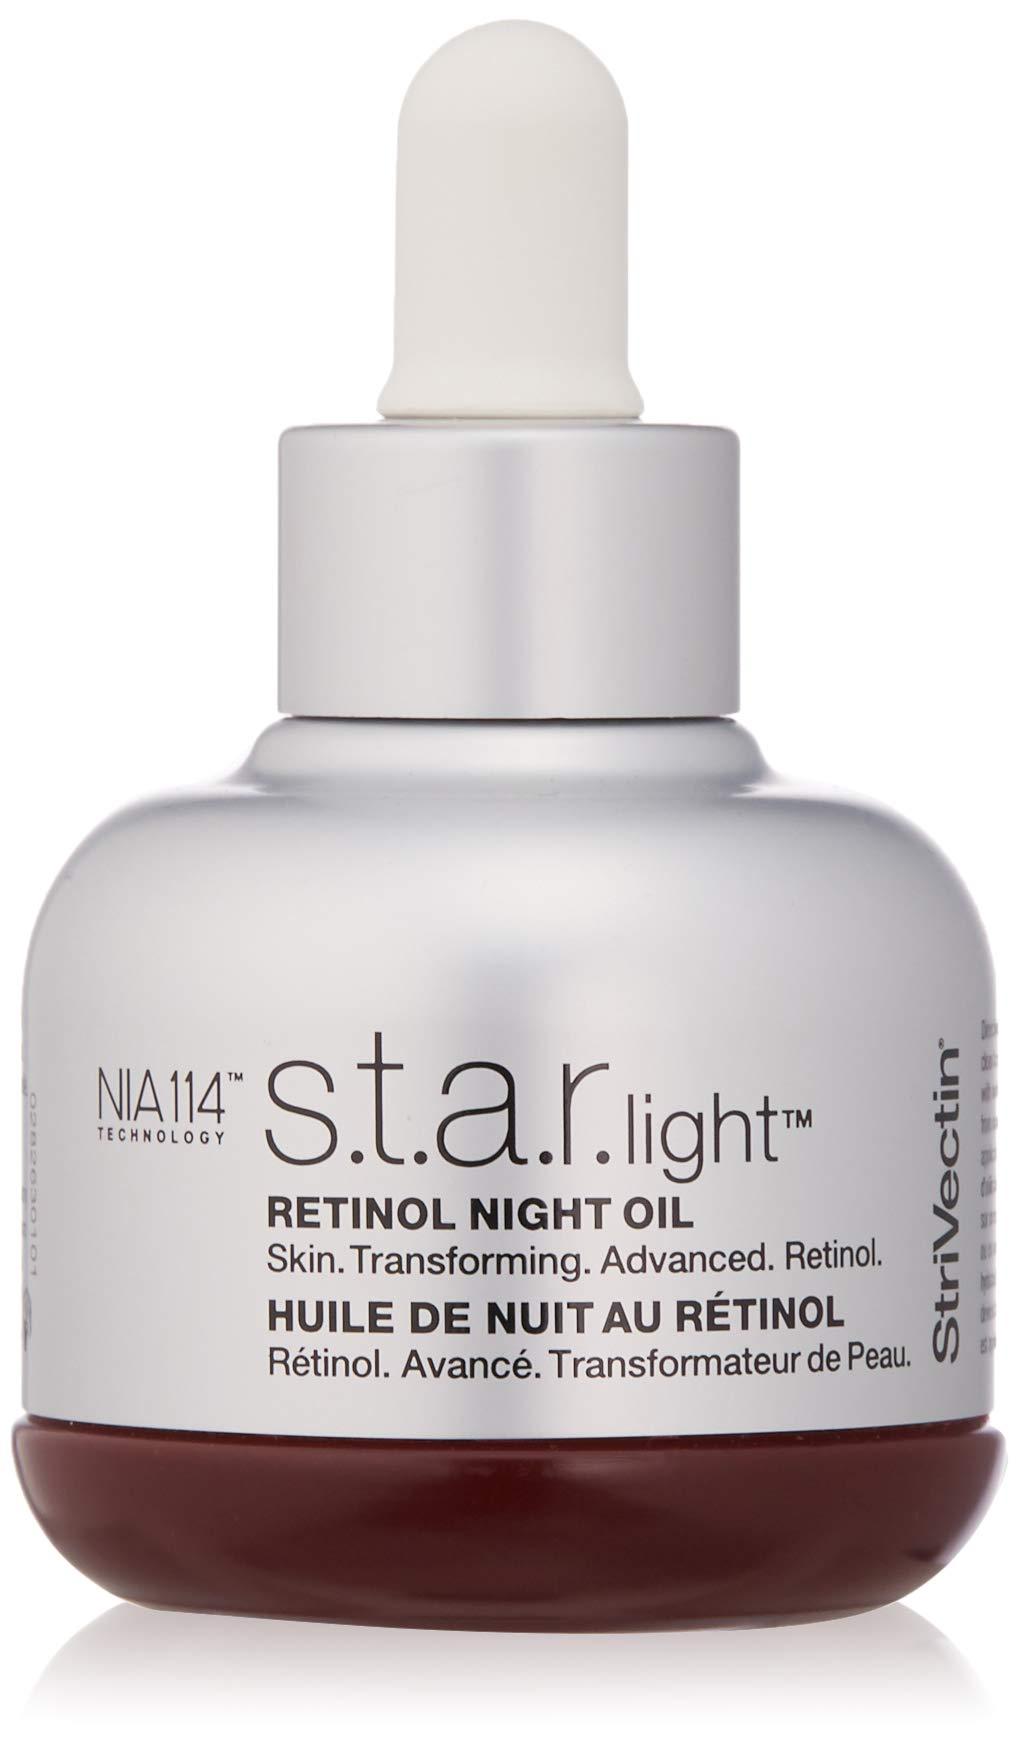 StriVectin S.t.a.r Light Retinol Night Oil, 1 fl. oz. by StriVectin (Image #1)